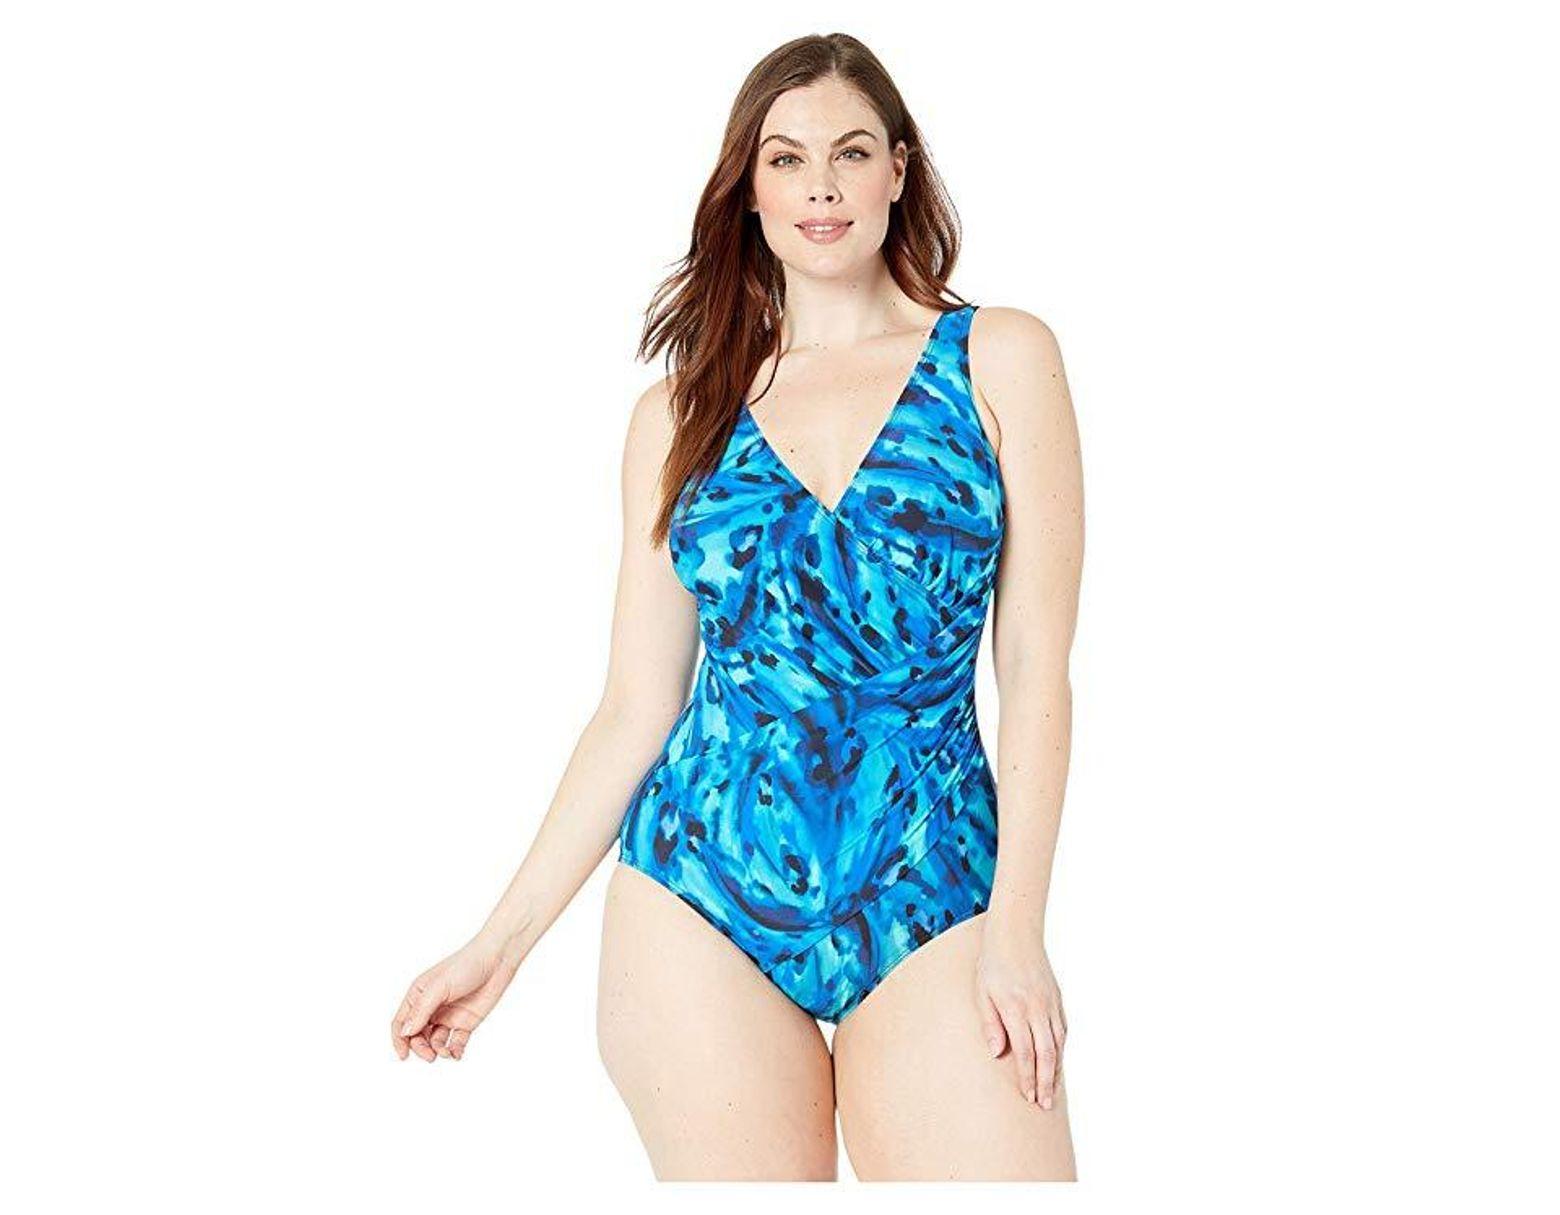 d0b75a2514d398 Miraclesuit Plus Size Ocean Ocelot Oceanus One-piece (blue) Swimsuits One  Piece in Blue - Save 23% - Lyst